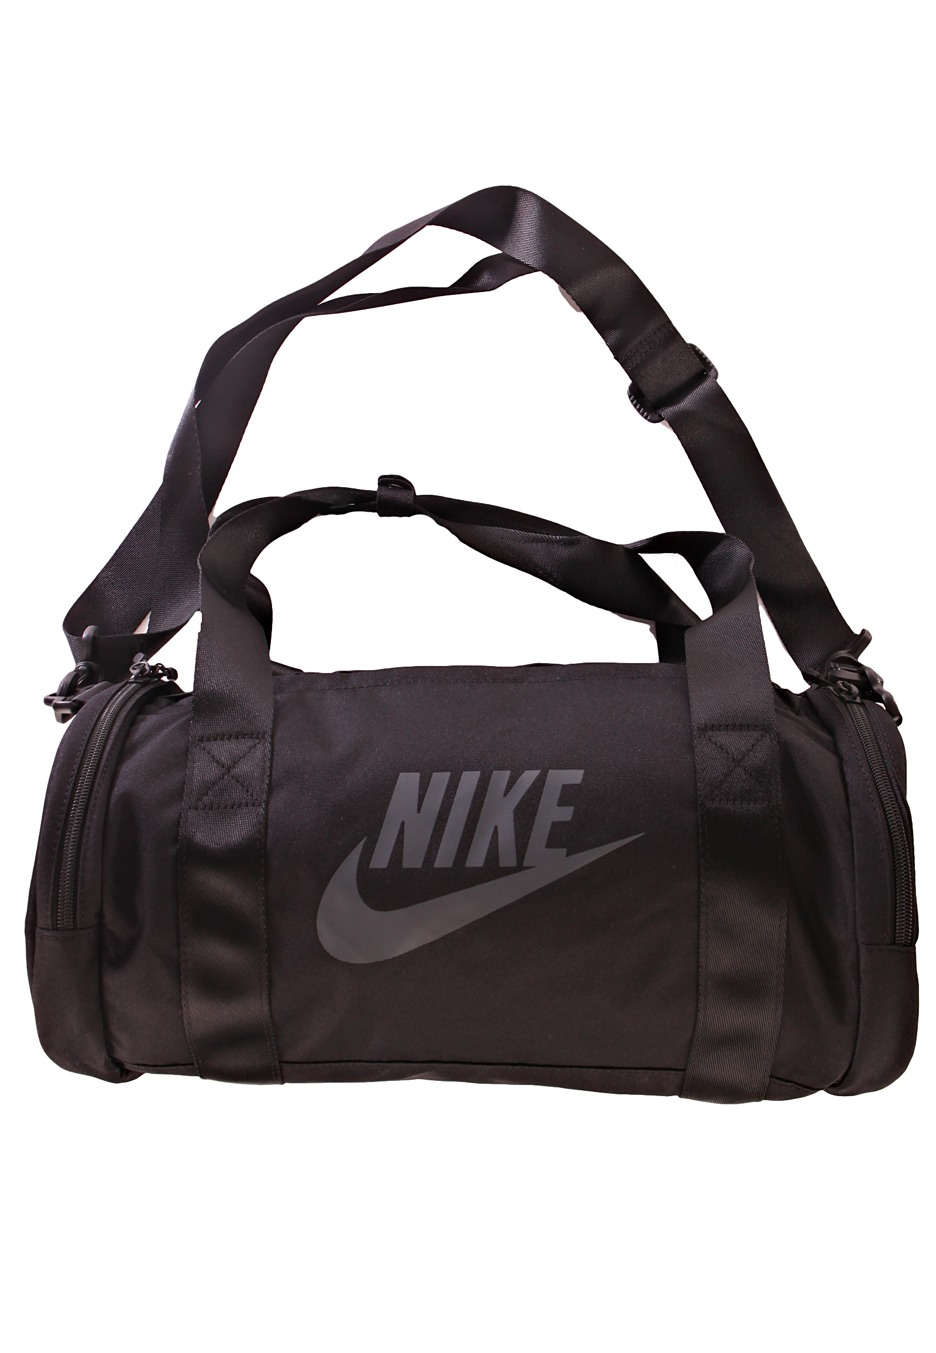 Unique Bags For Women - Nike Brasilia Small Duffel Bag - My Choes - Fashion U0026 Fancy